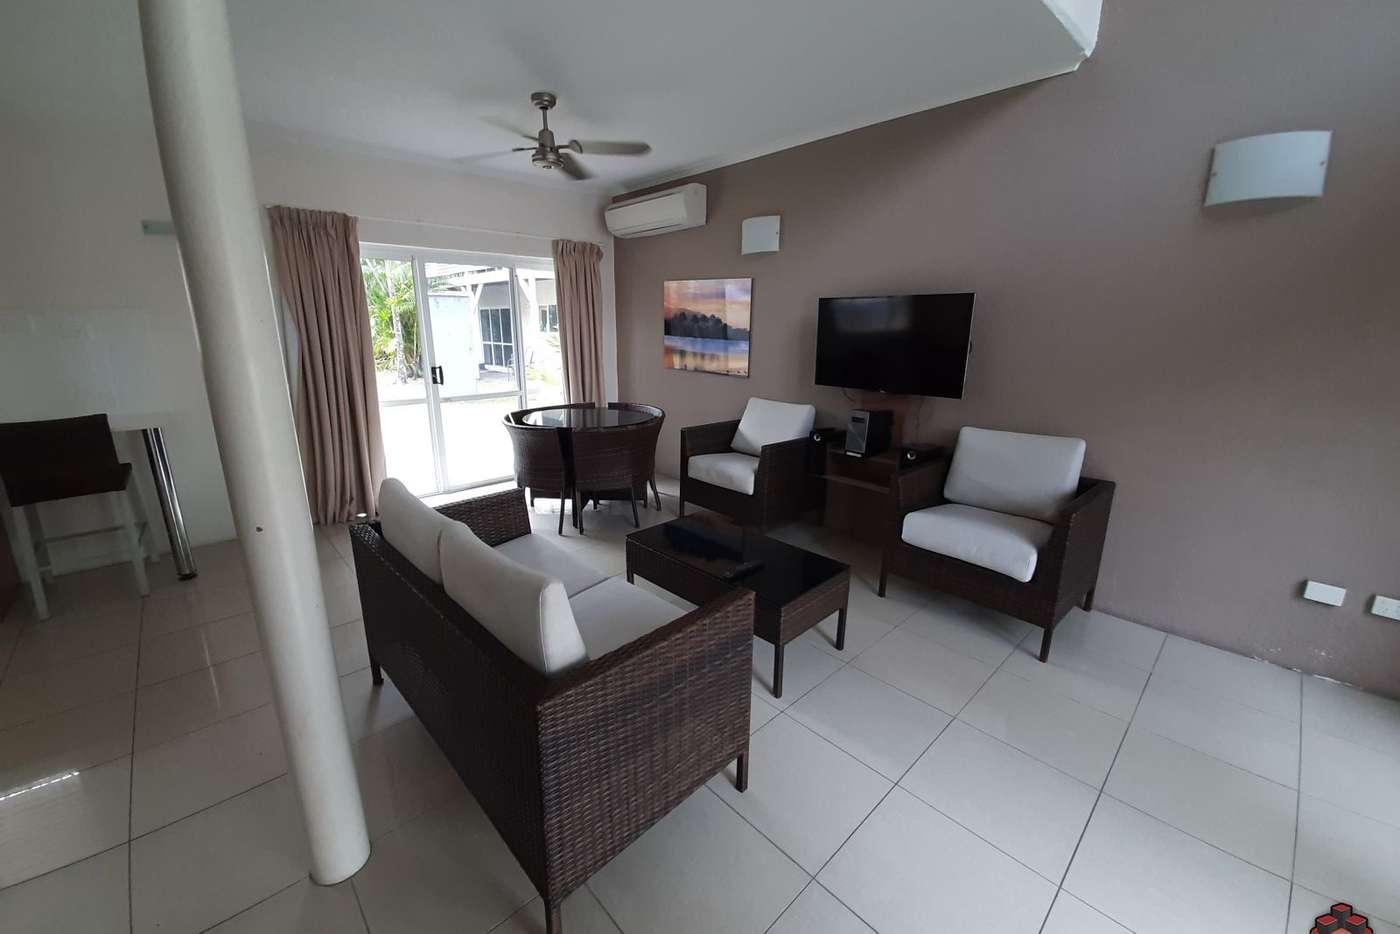 Main view of Homely villa listing, ID:21066339/121 Port Douglas Road, Port Douglas QLD 4877